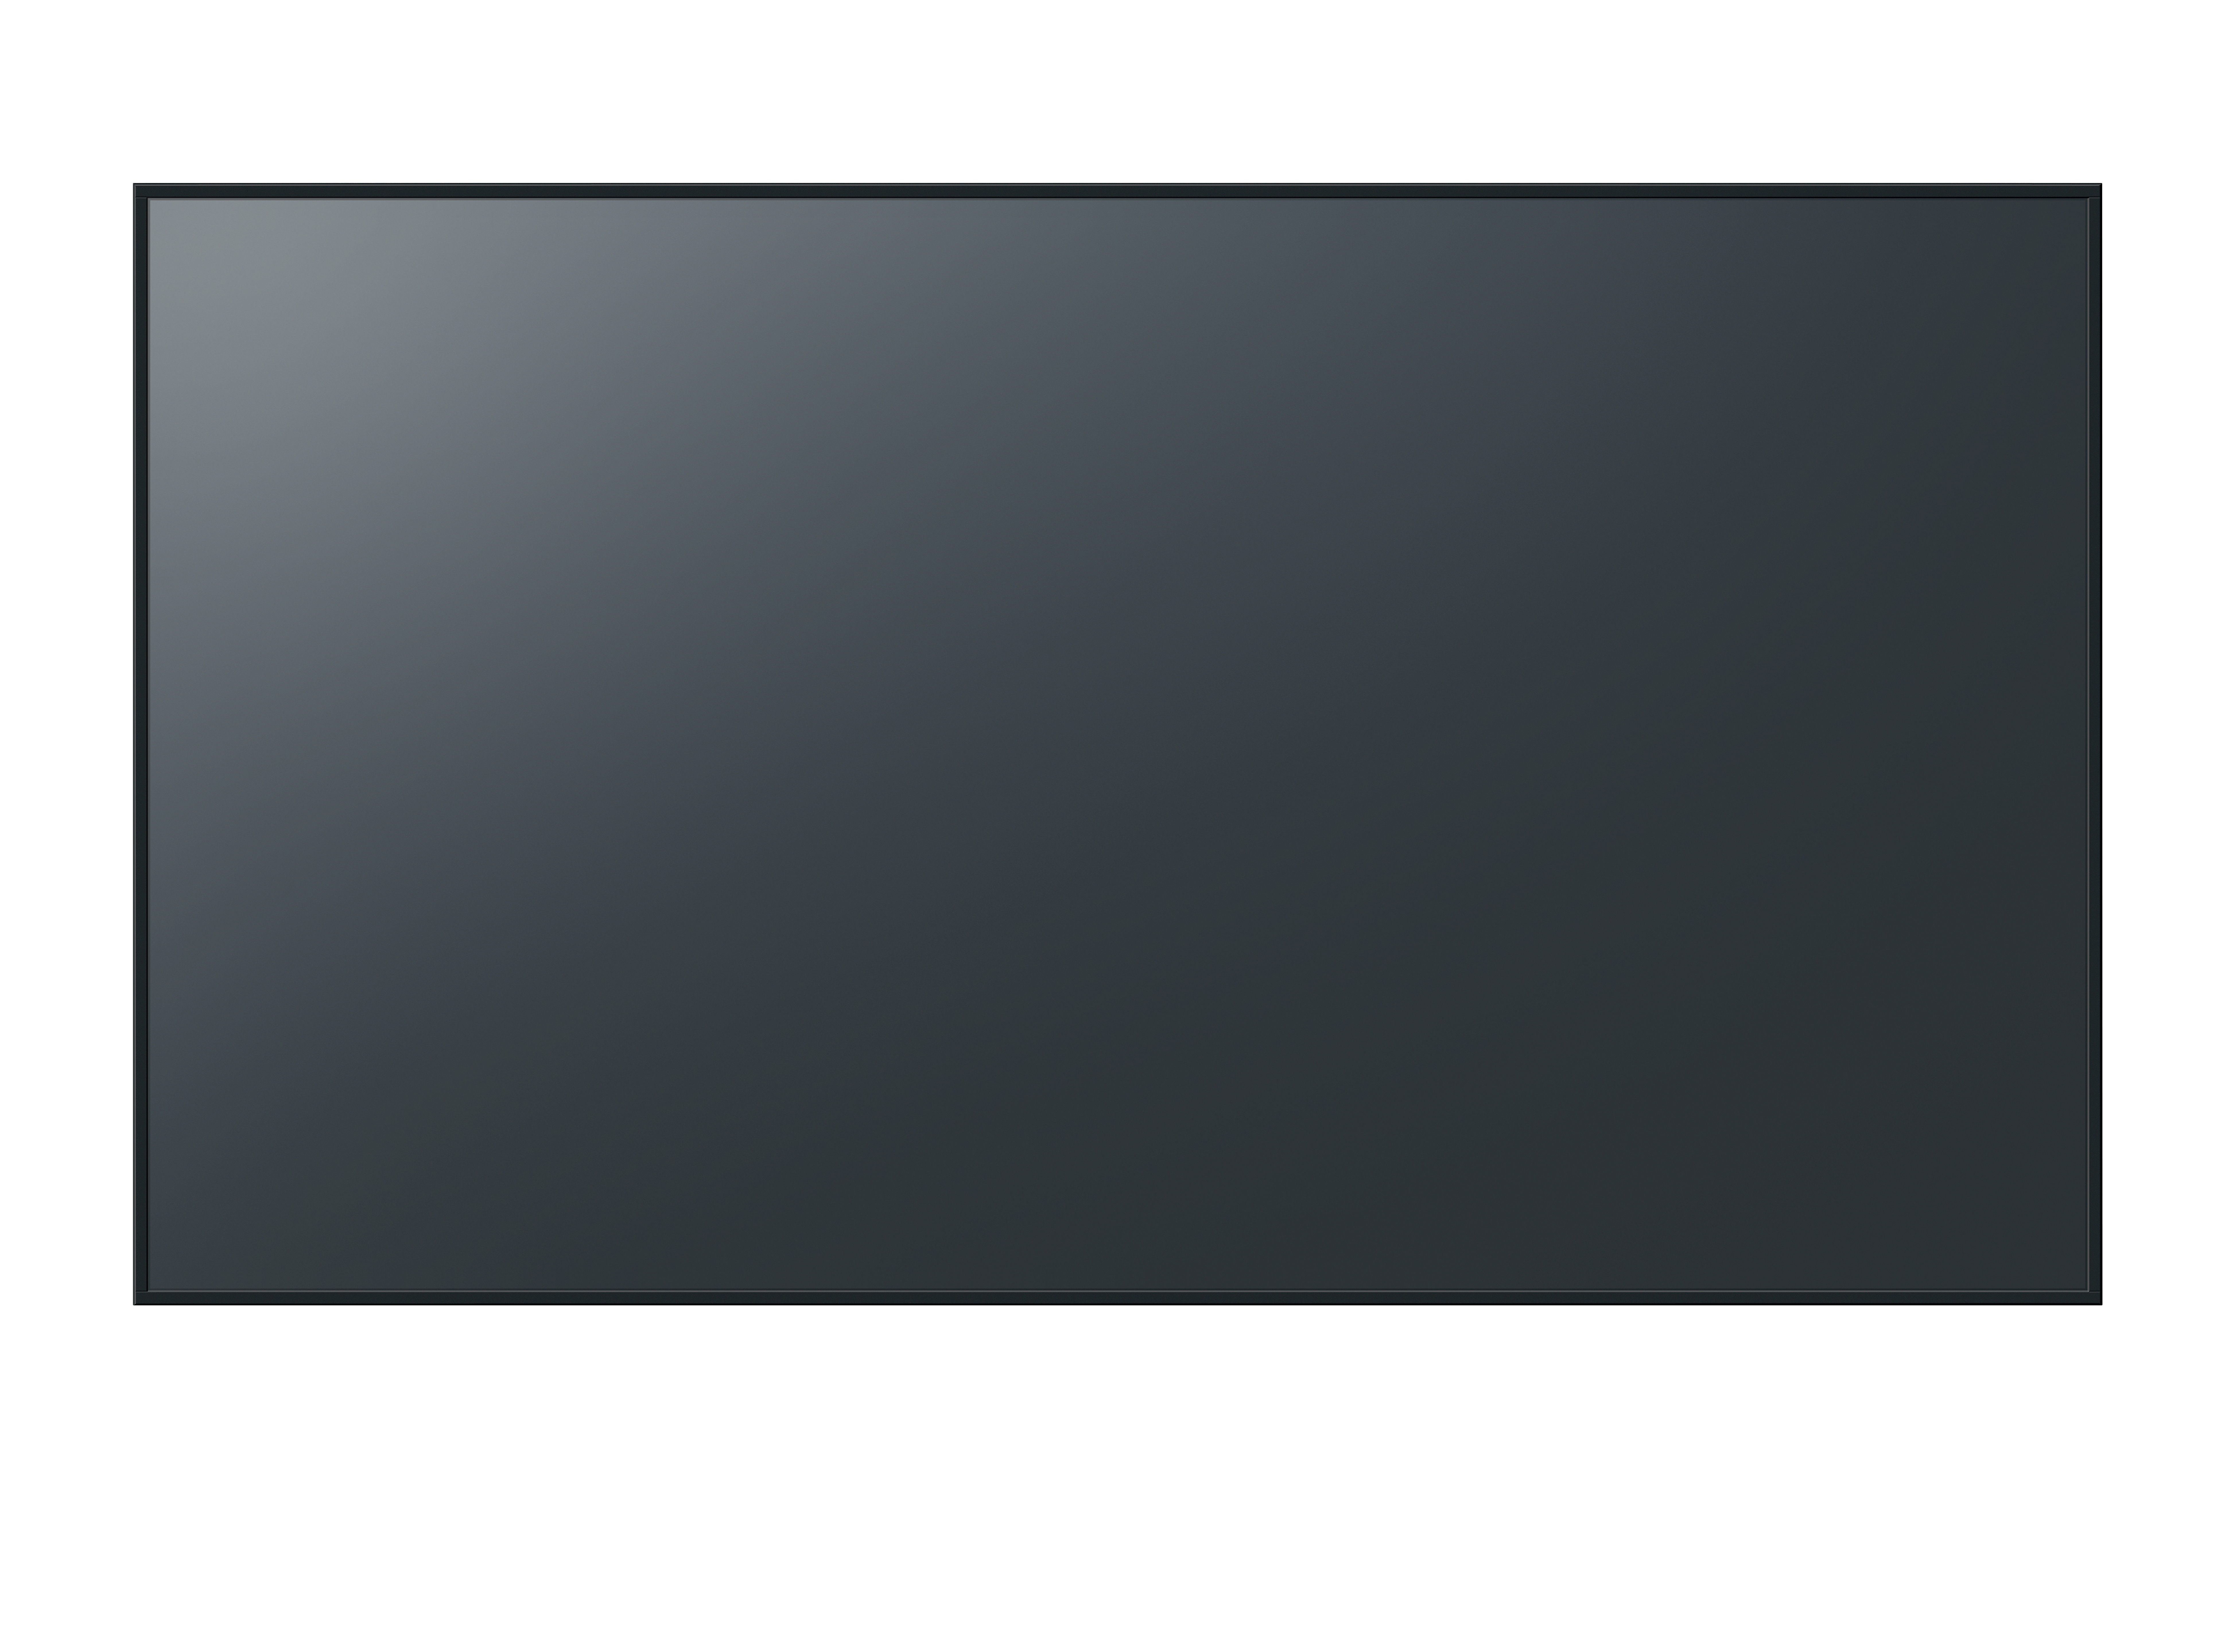 PANASONIC  PANASONIC TH-43EQ1 - Ecran professionnel Résolution UHD 4K, 350 cd - 43``